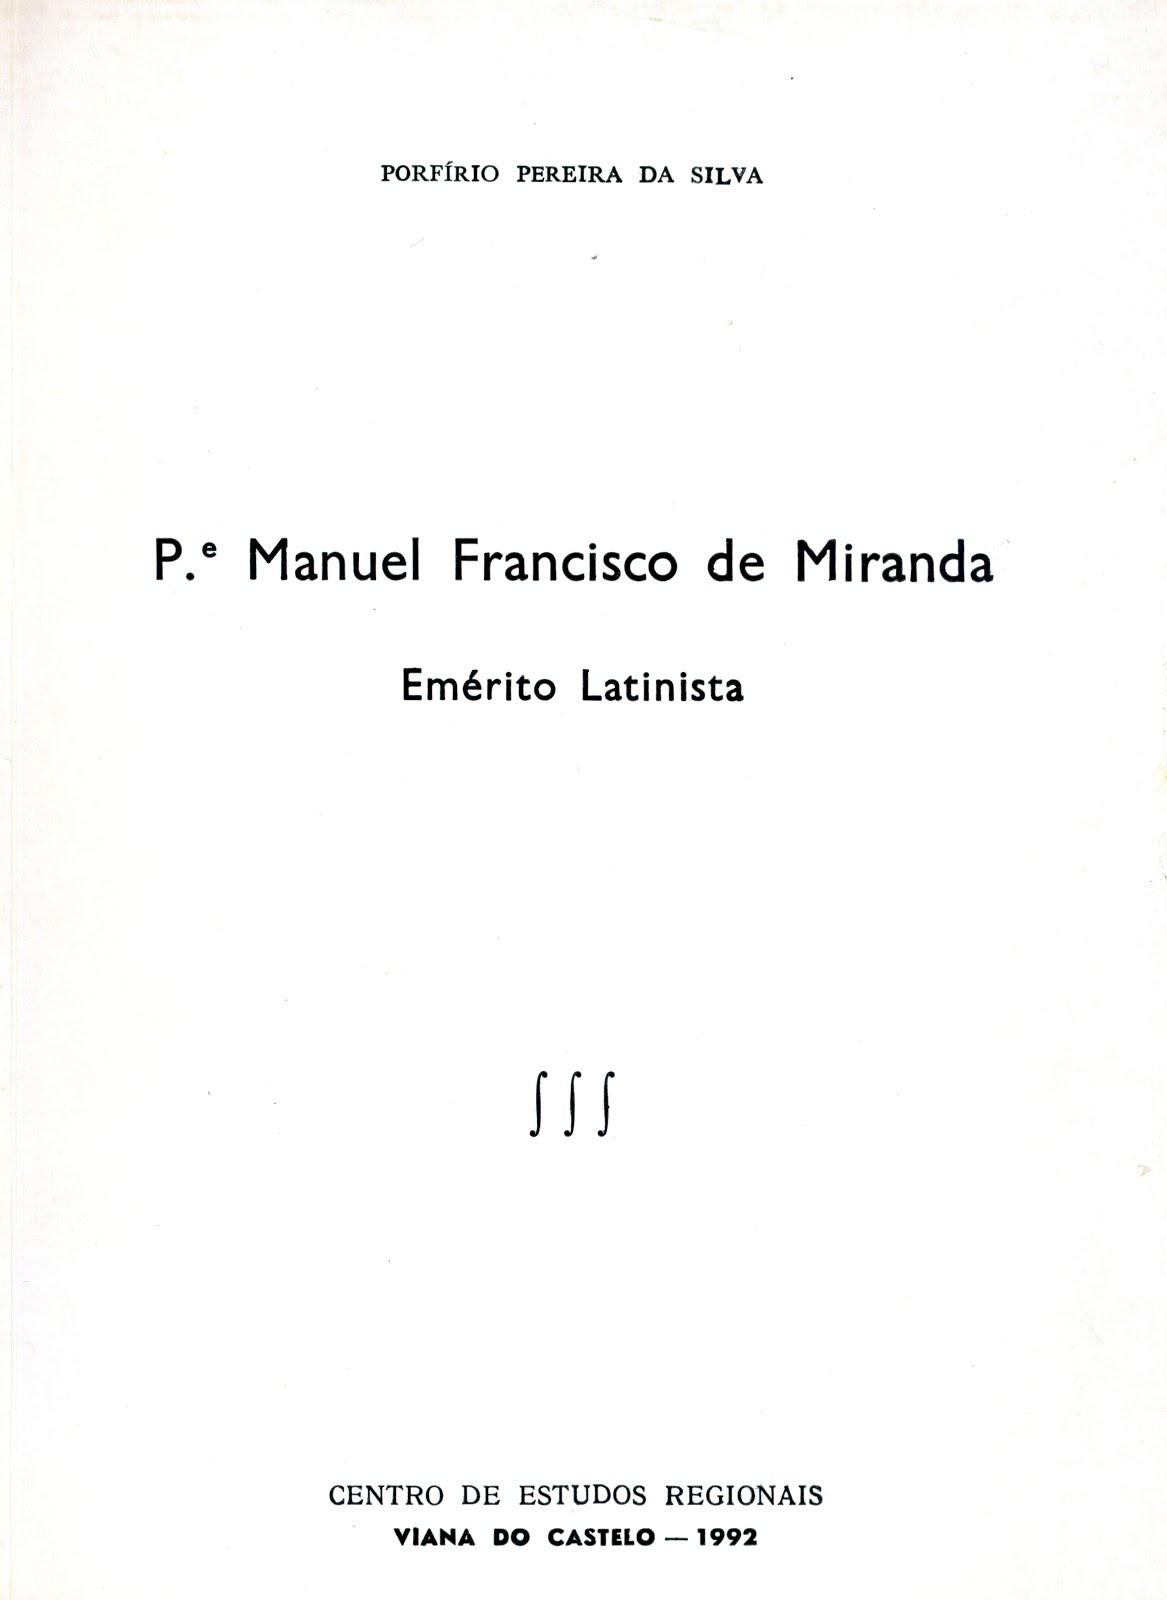 MANUEL FRANCISCO DE MIRANDA: EMÉRITO LATINISTA